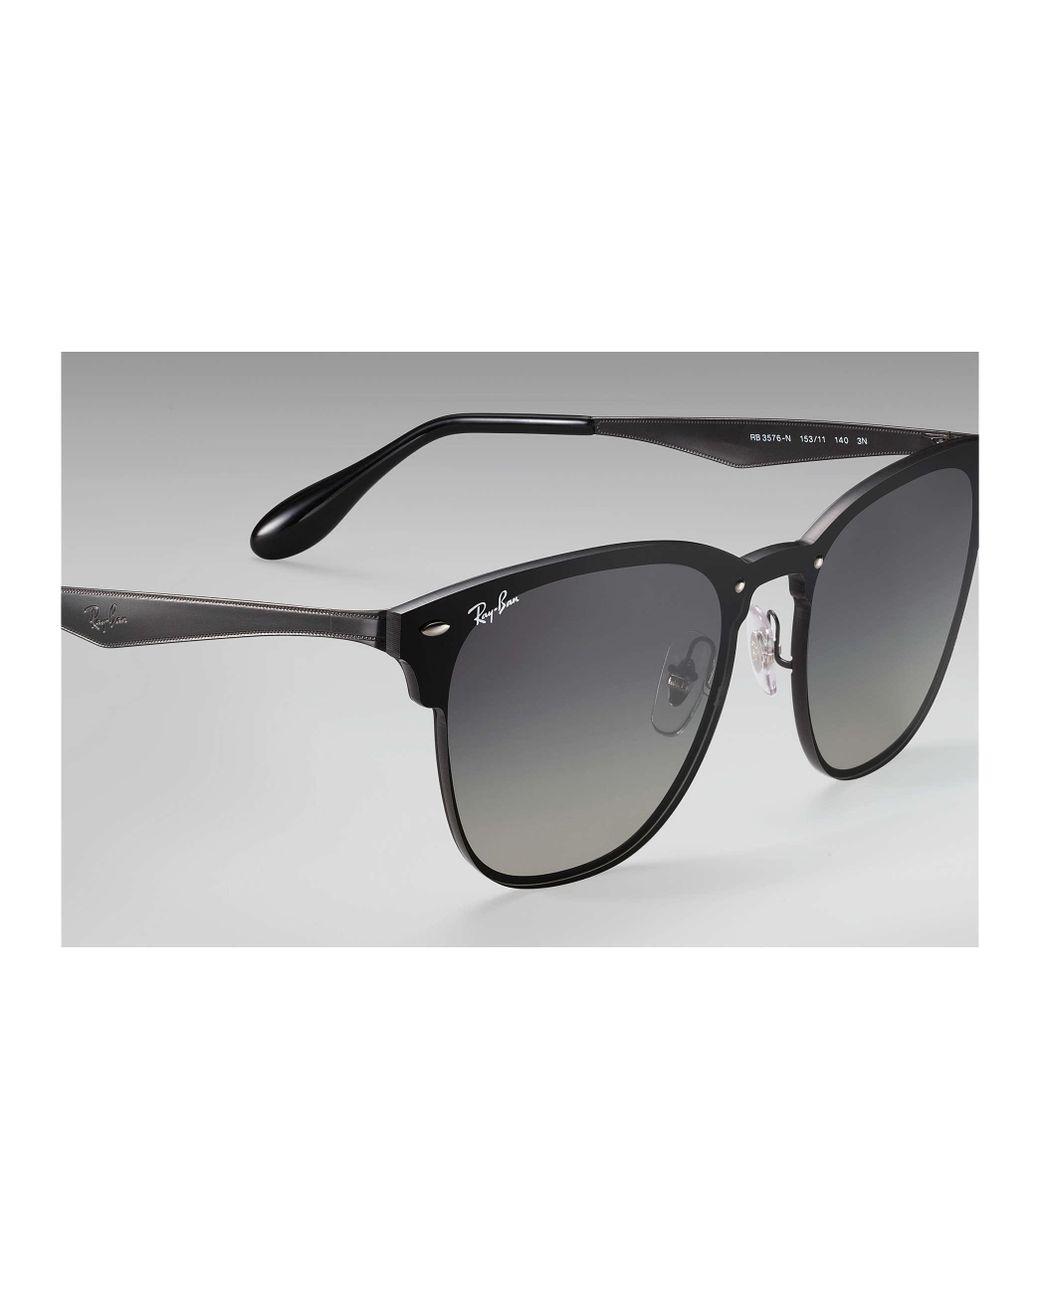 88d784c2c5 Ray-Ban Blaze Clubmaster Black in Black - Save 5% - Lyst